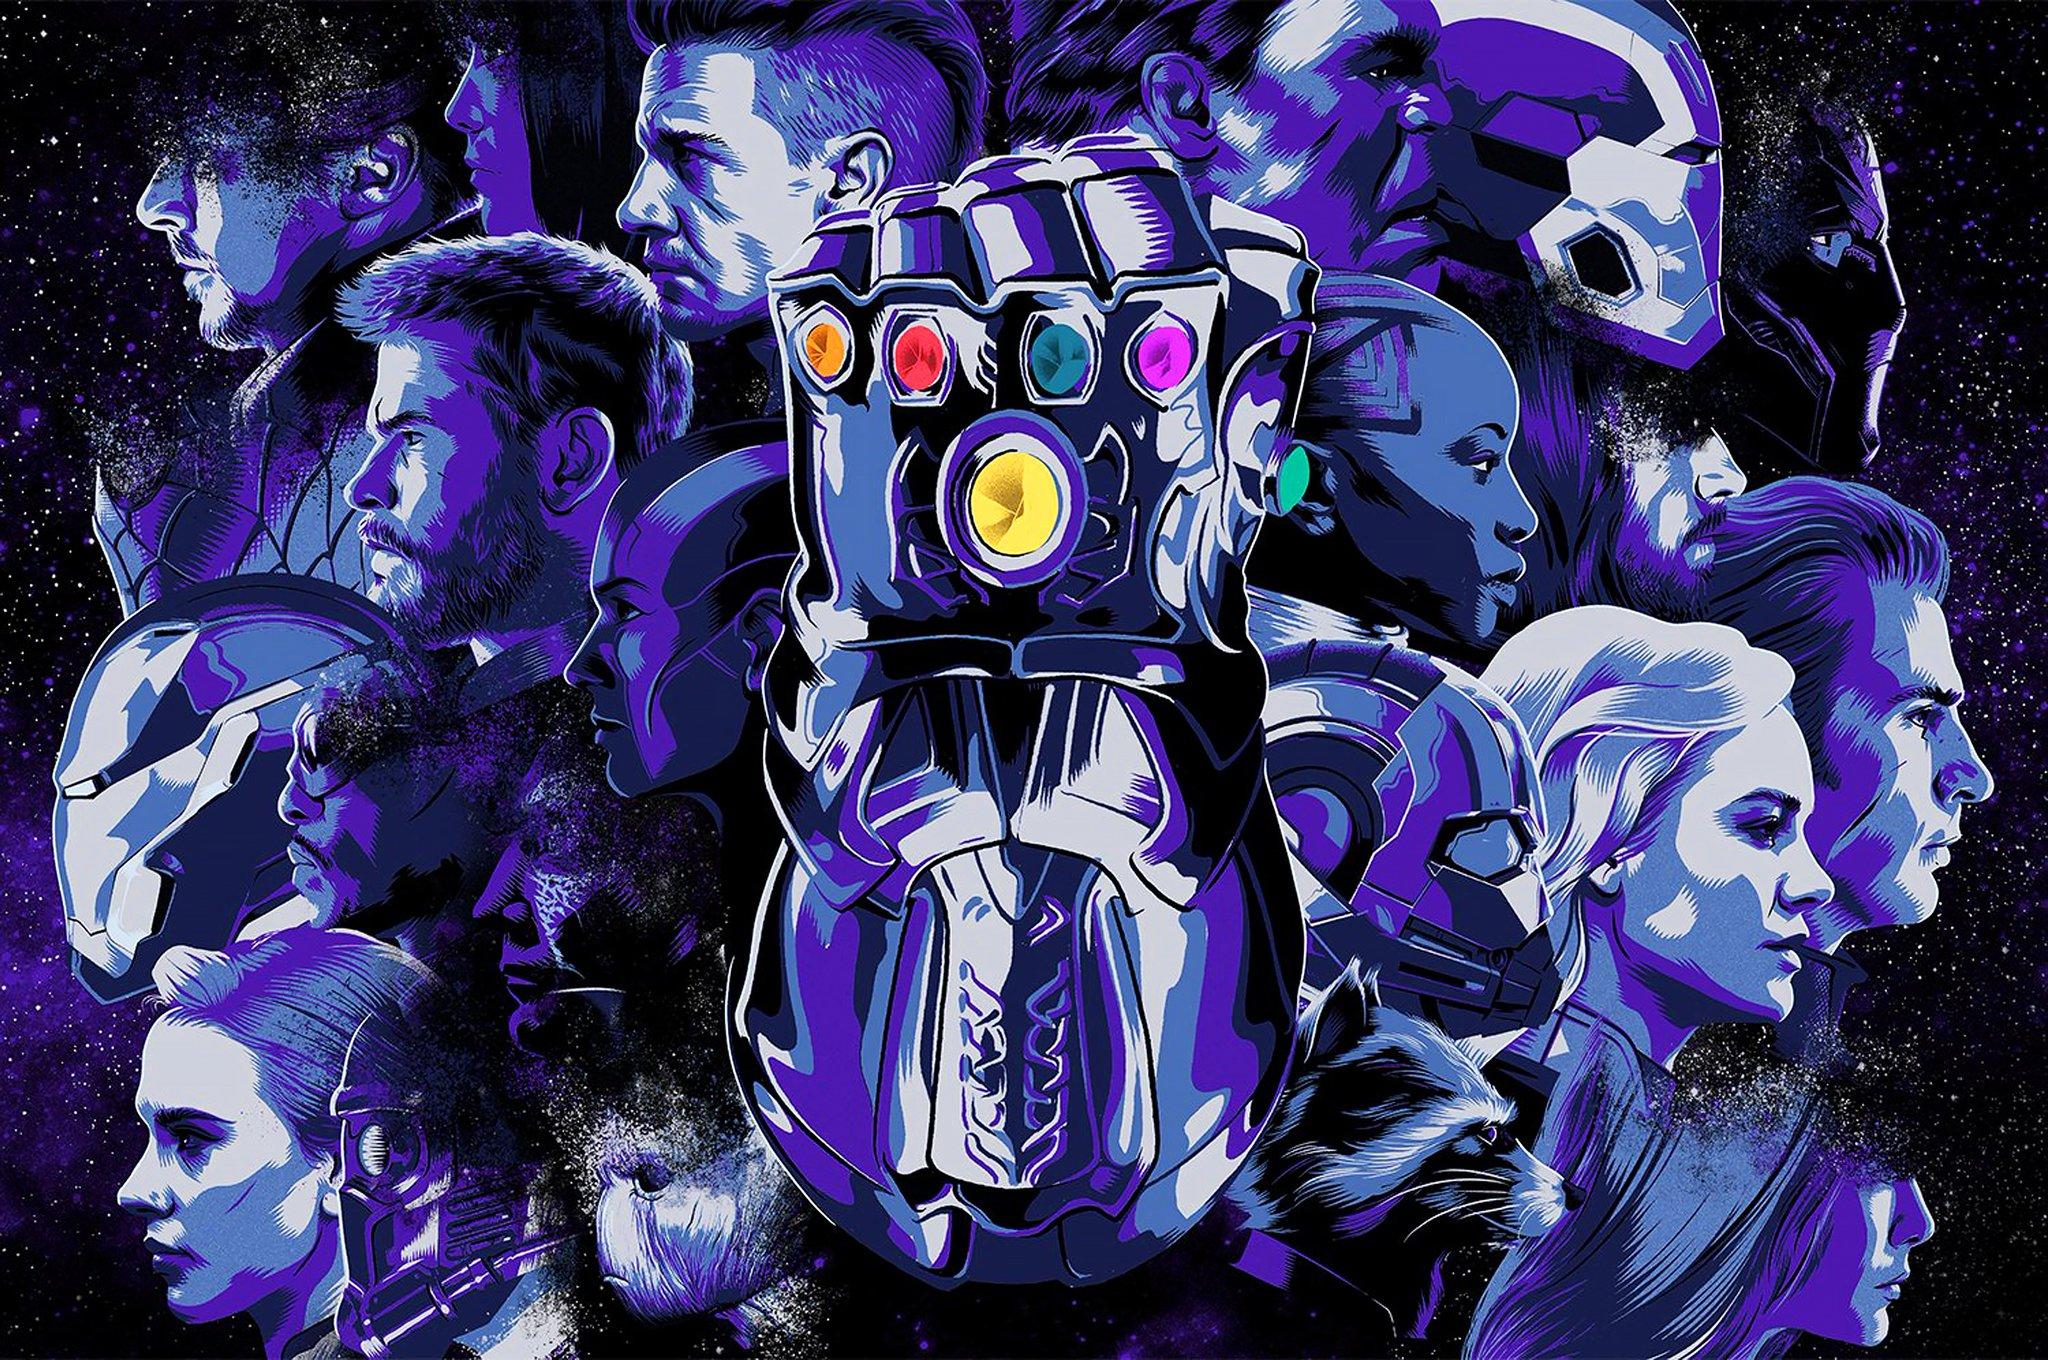 Tá saindo as artes promocionais ������ #VingadoresUltimato #AvengersEndgame https://t.co/w6GOEGOmKU